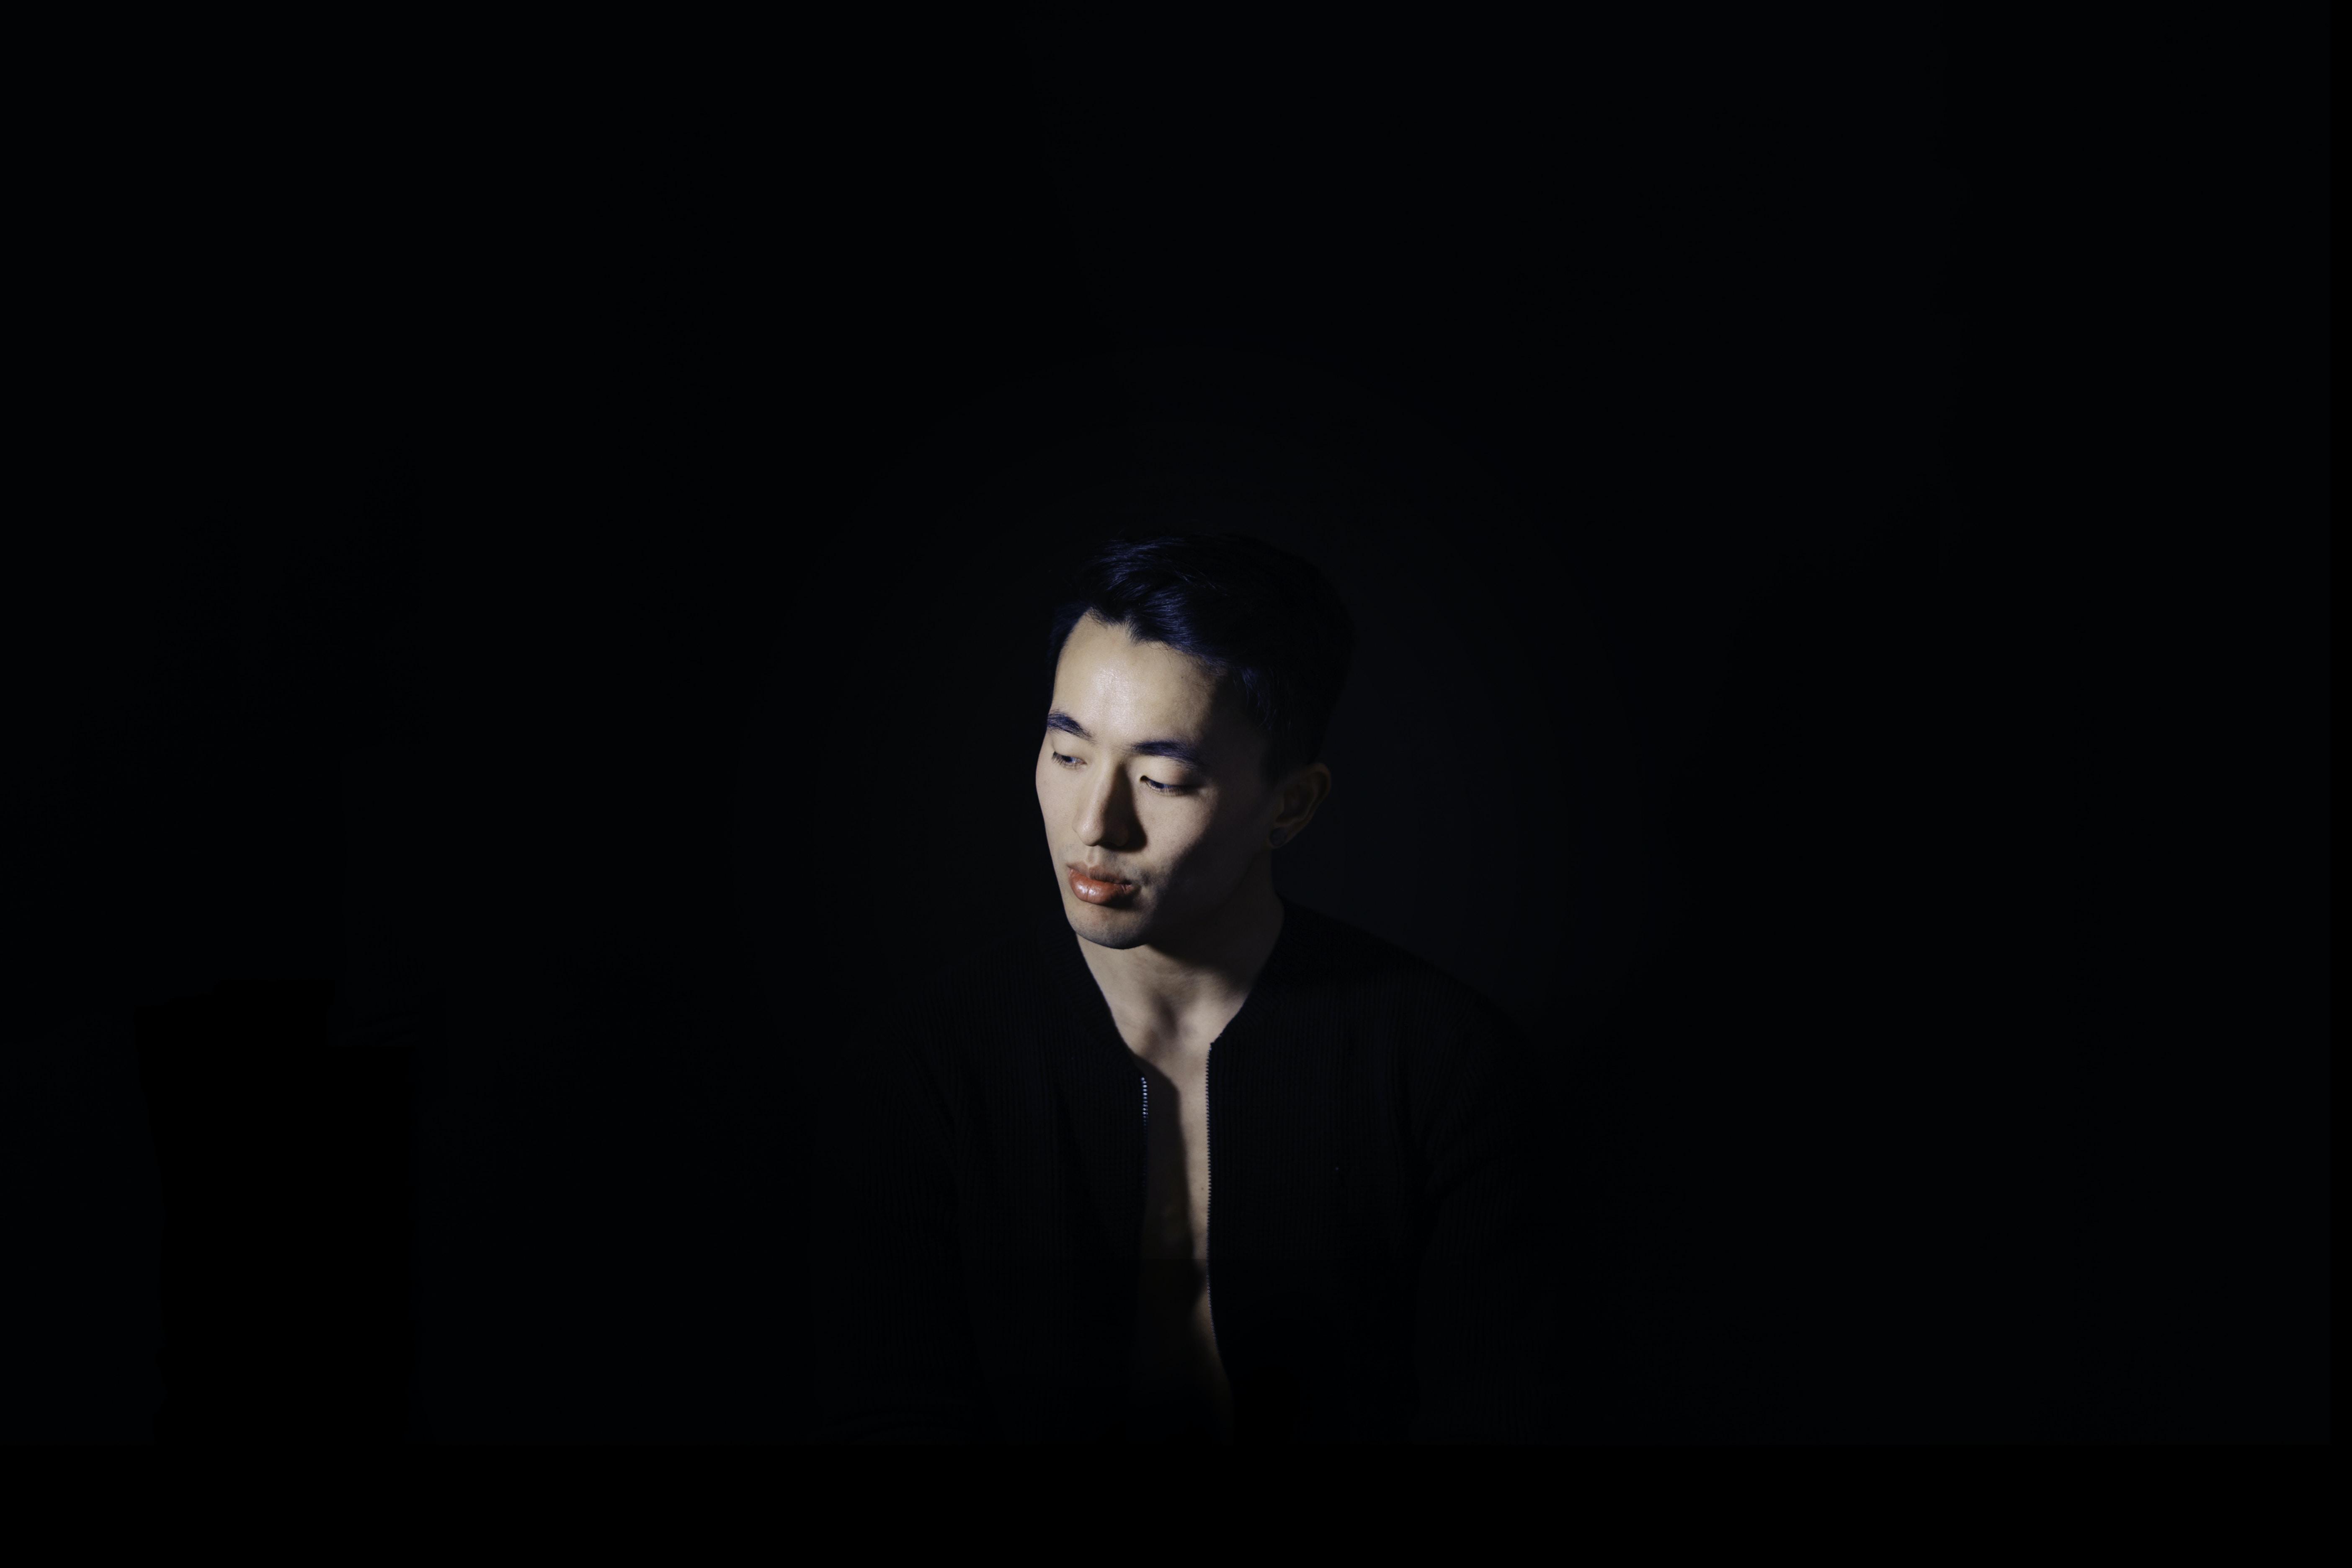 man standing wearing black top